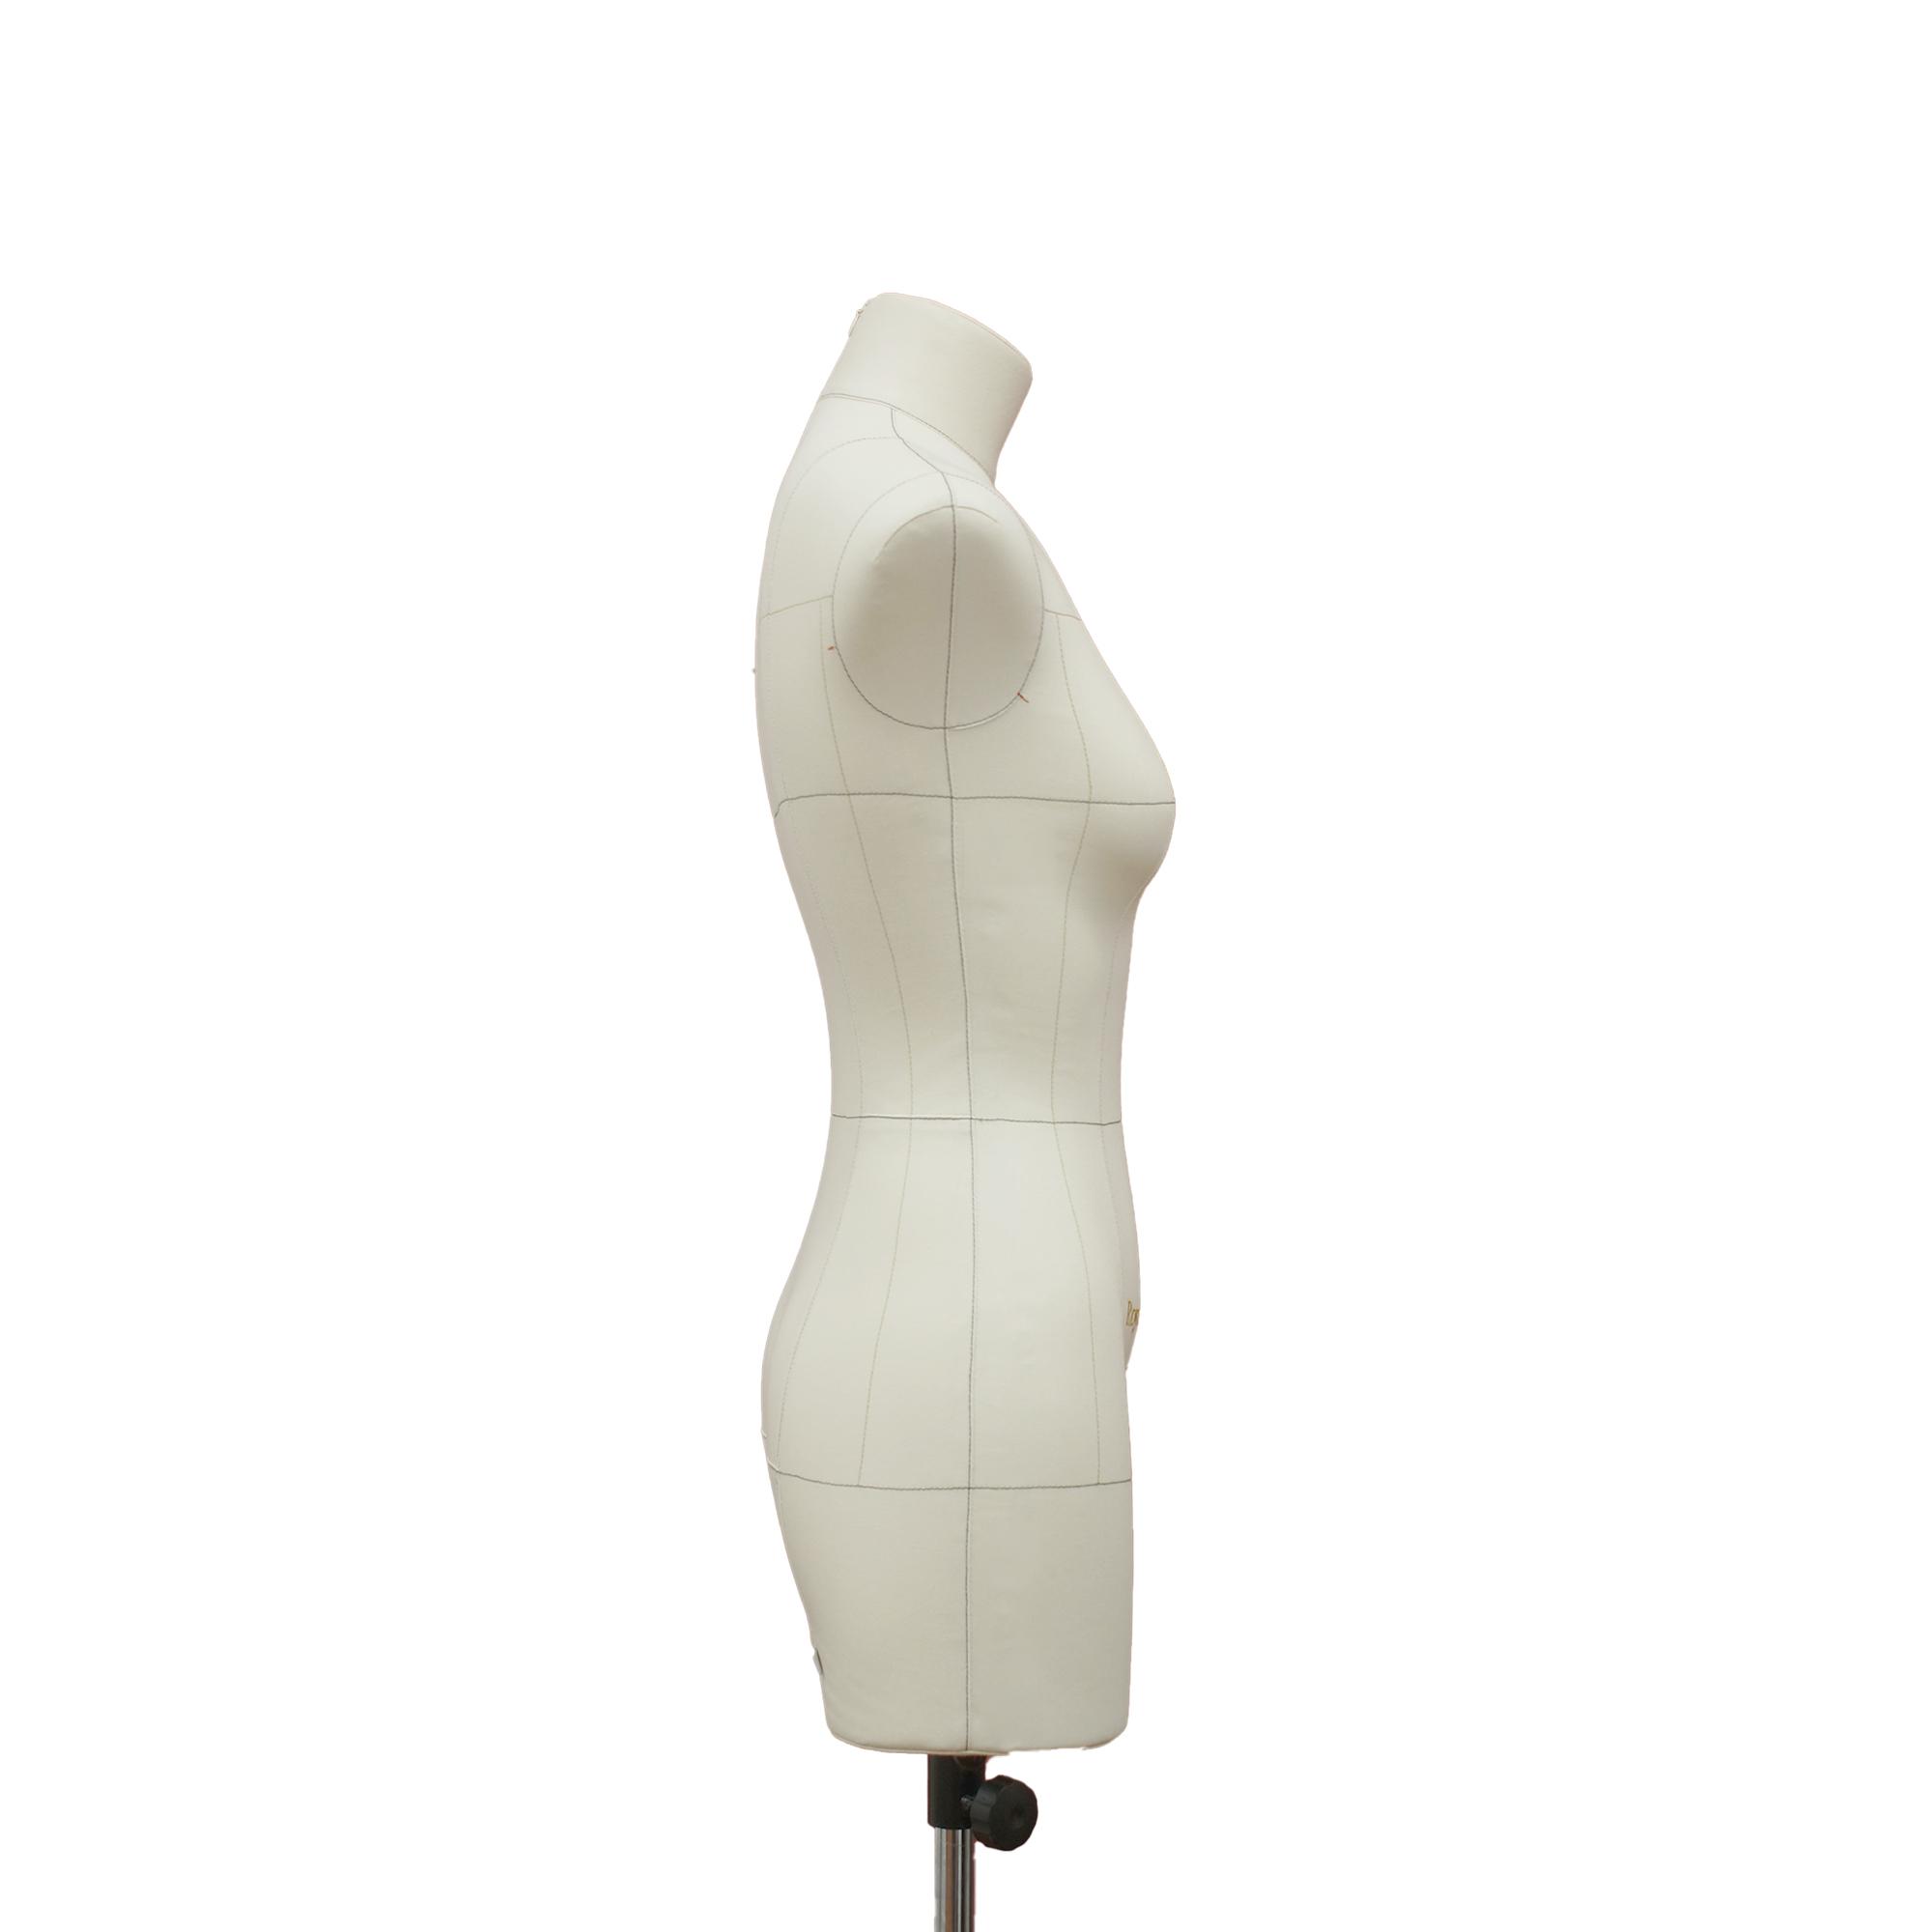 Манекен портновский Моника, комплект Стандарт, размер 44, тип фигуры Прямоугольник, бежевыйФото 2